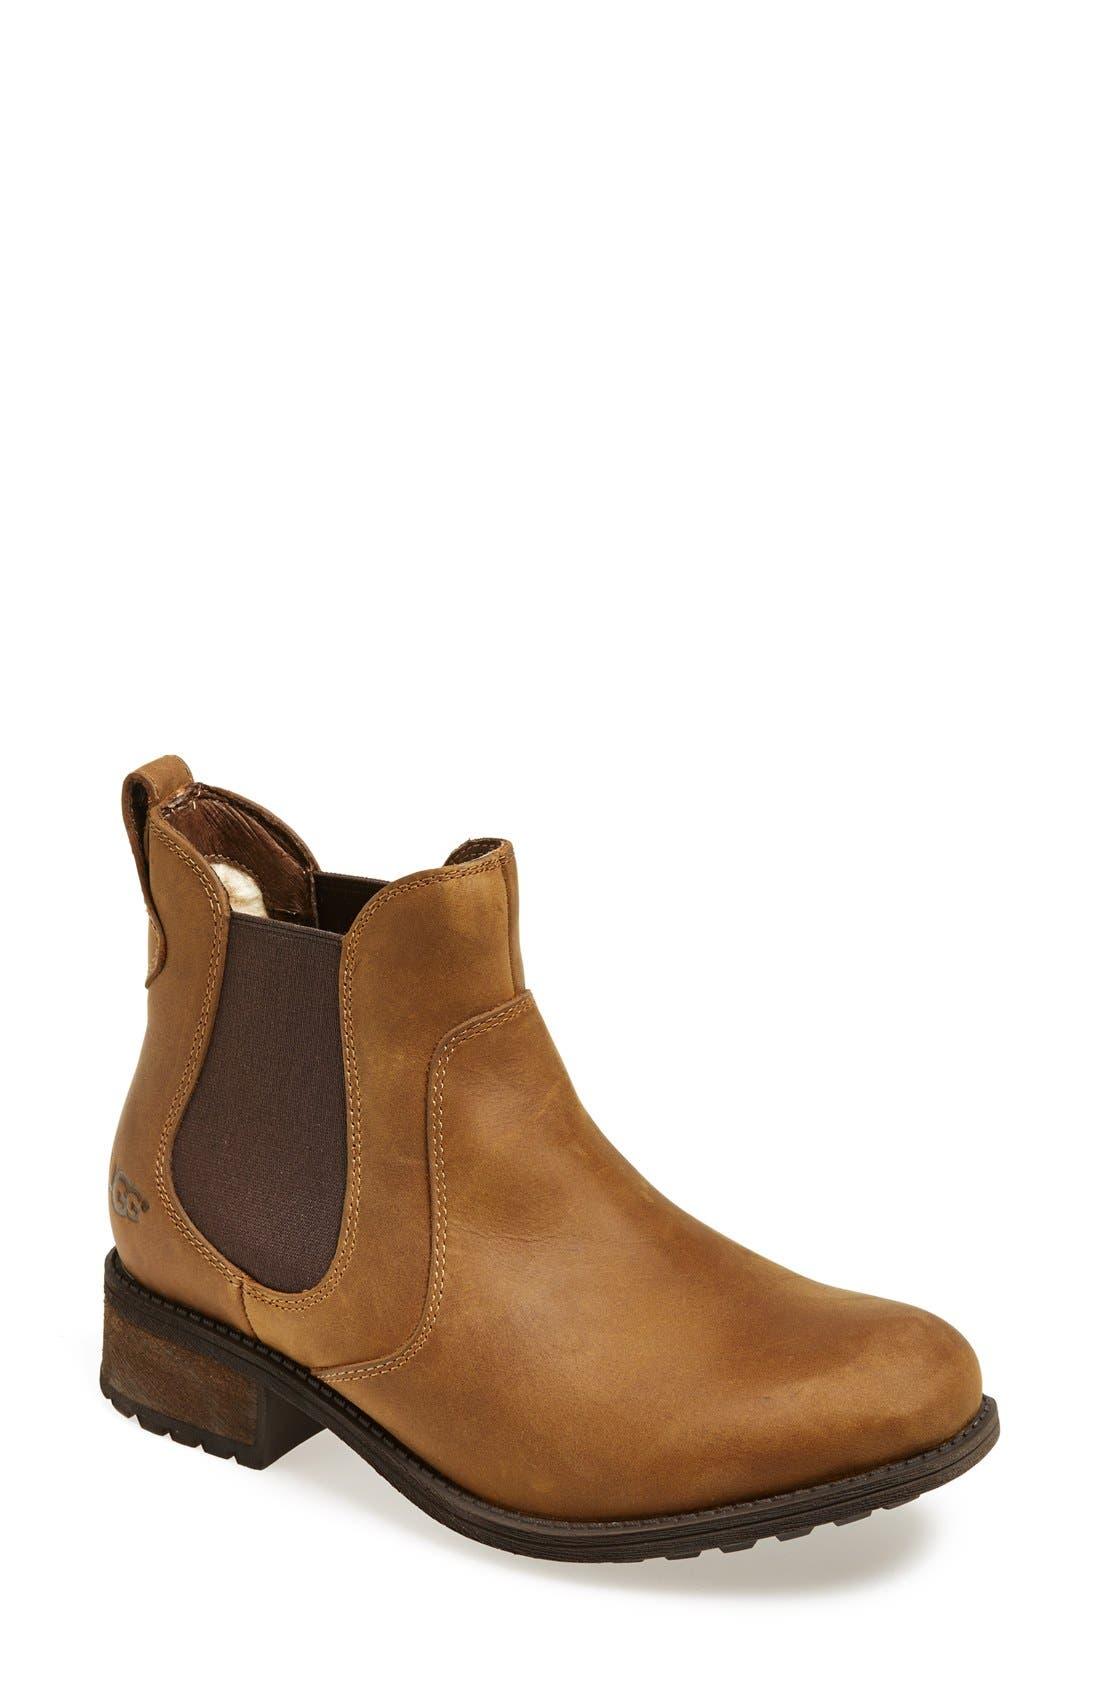 Alternate Image 1 Selected - UGG® Australia 'Bonham' Water Resistant Chelsea Boot (Women)